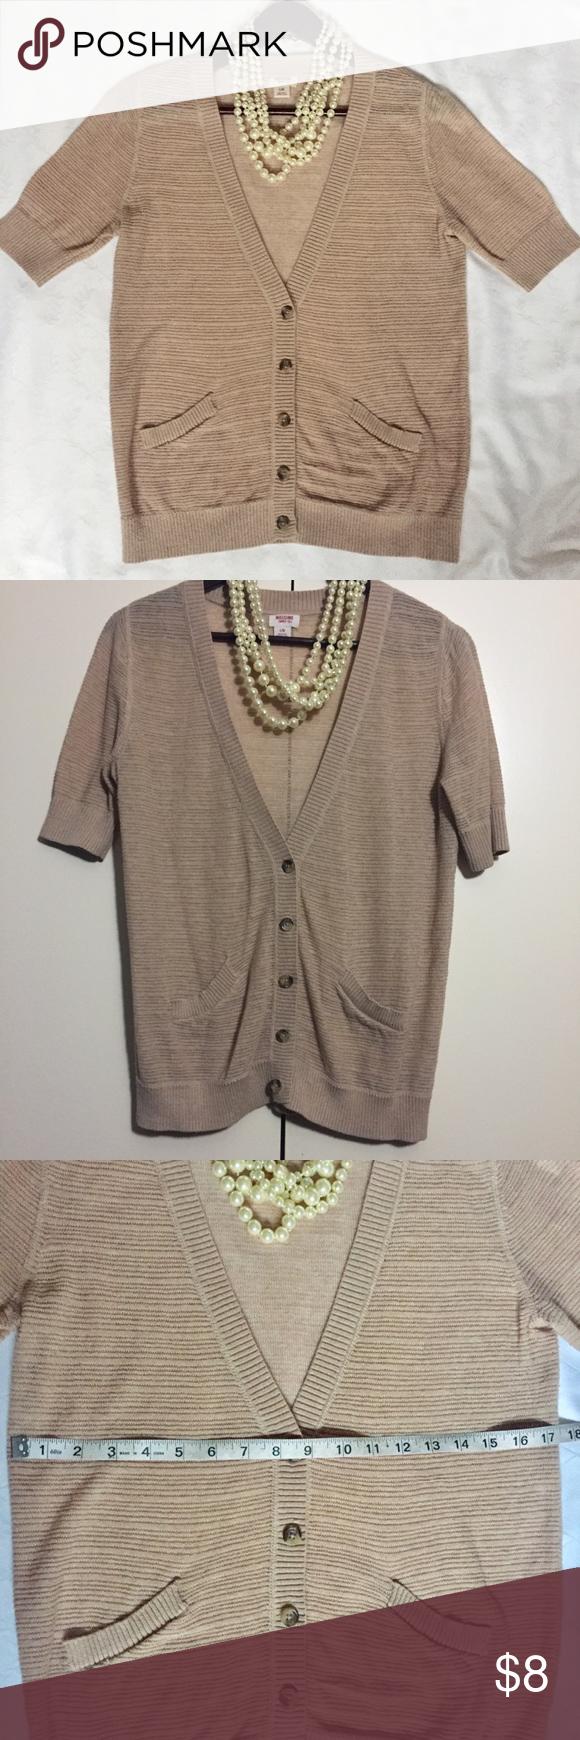 Mossimo tan short sleeve knit cardigan | Short sleeves, Customer ...